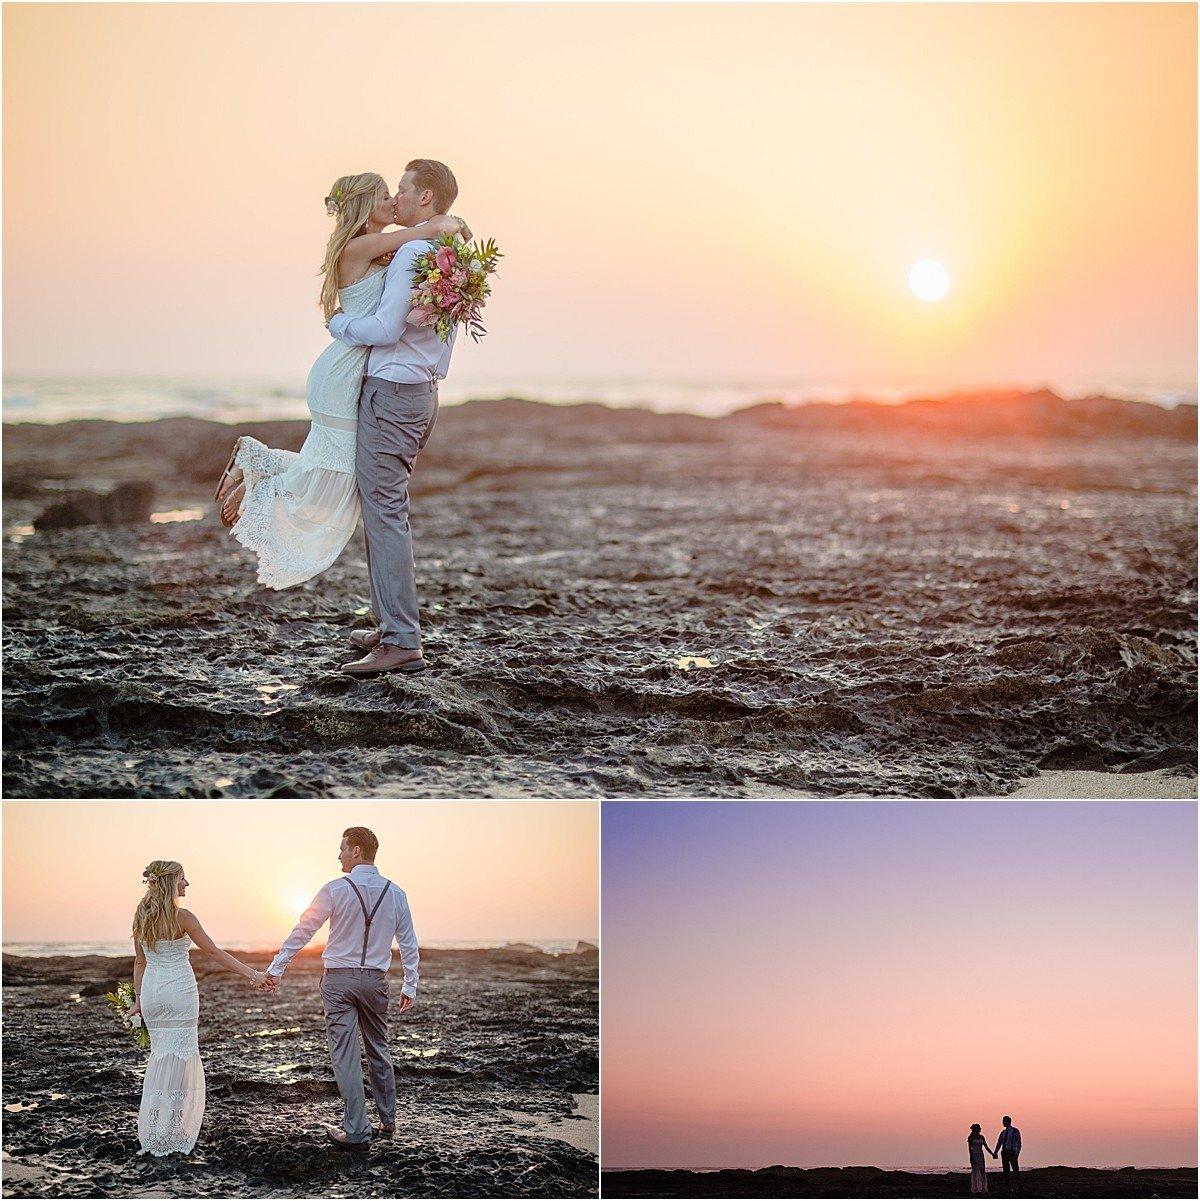 summer sunset in costa rica langosta